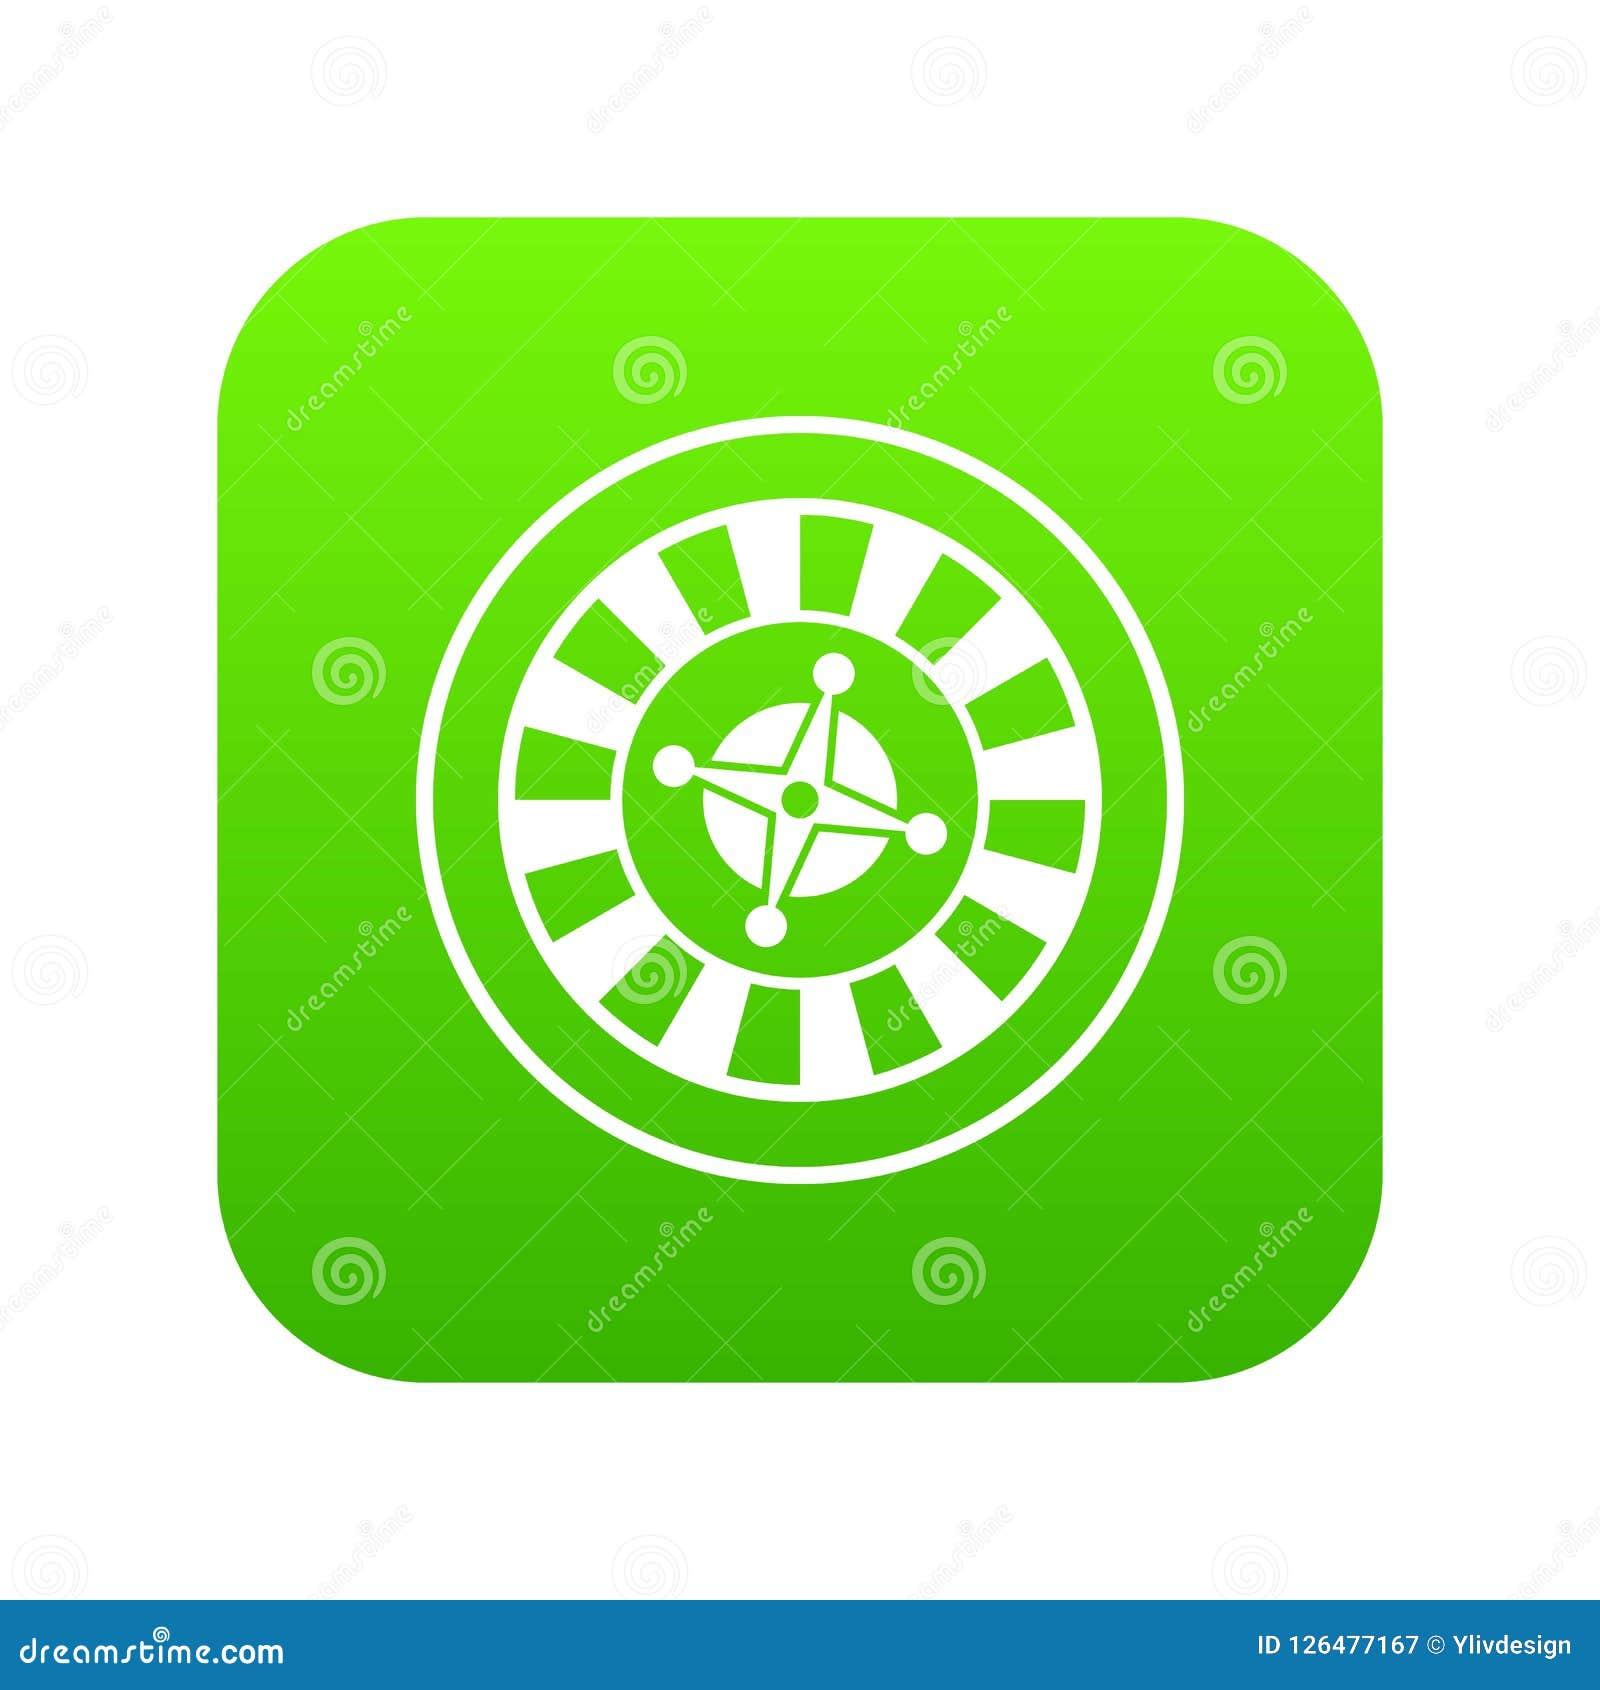 Casino gambling roulette icon digital green